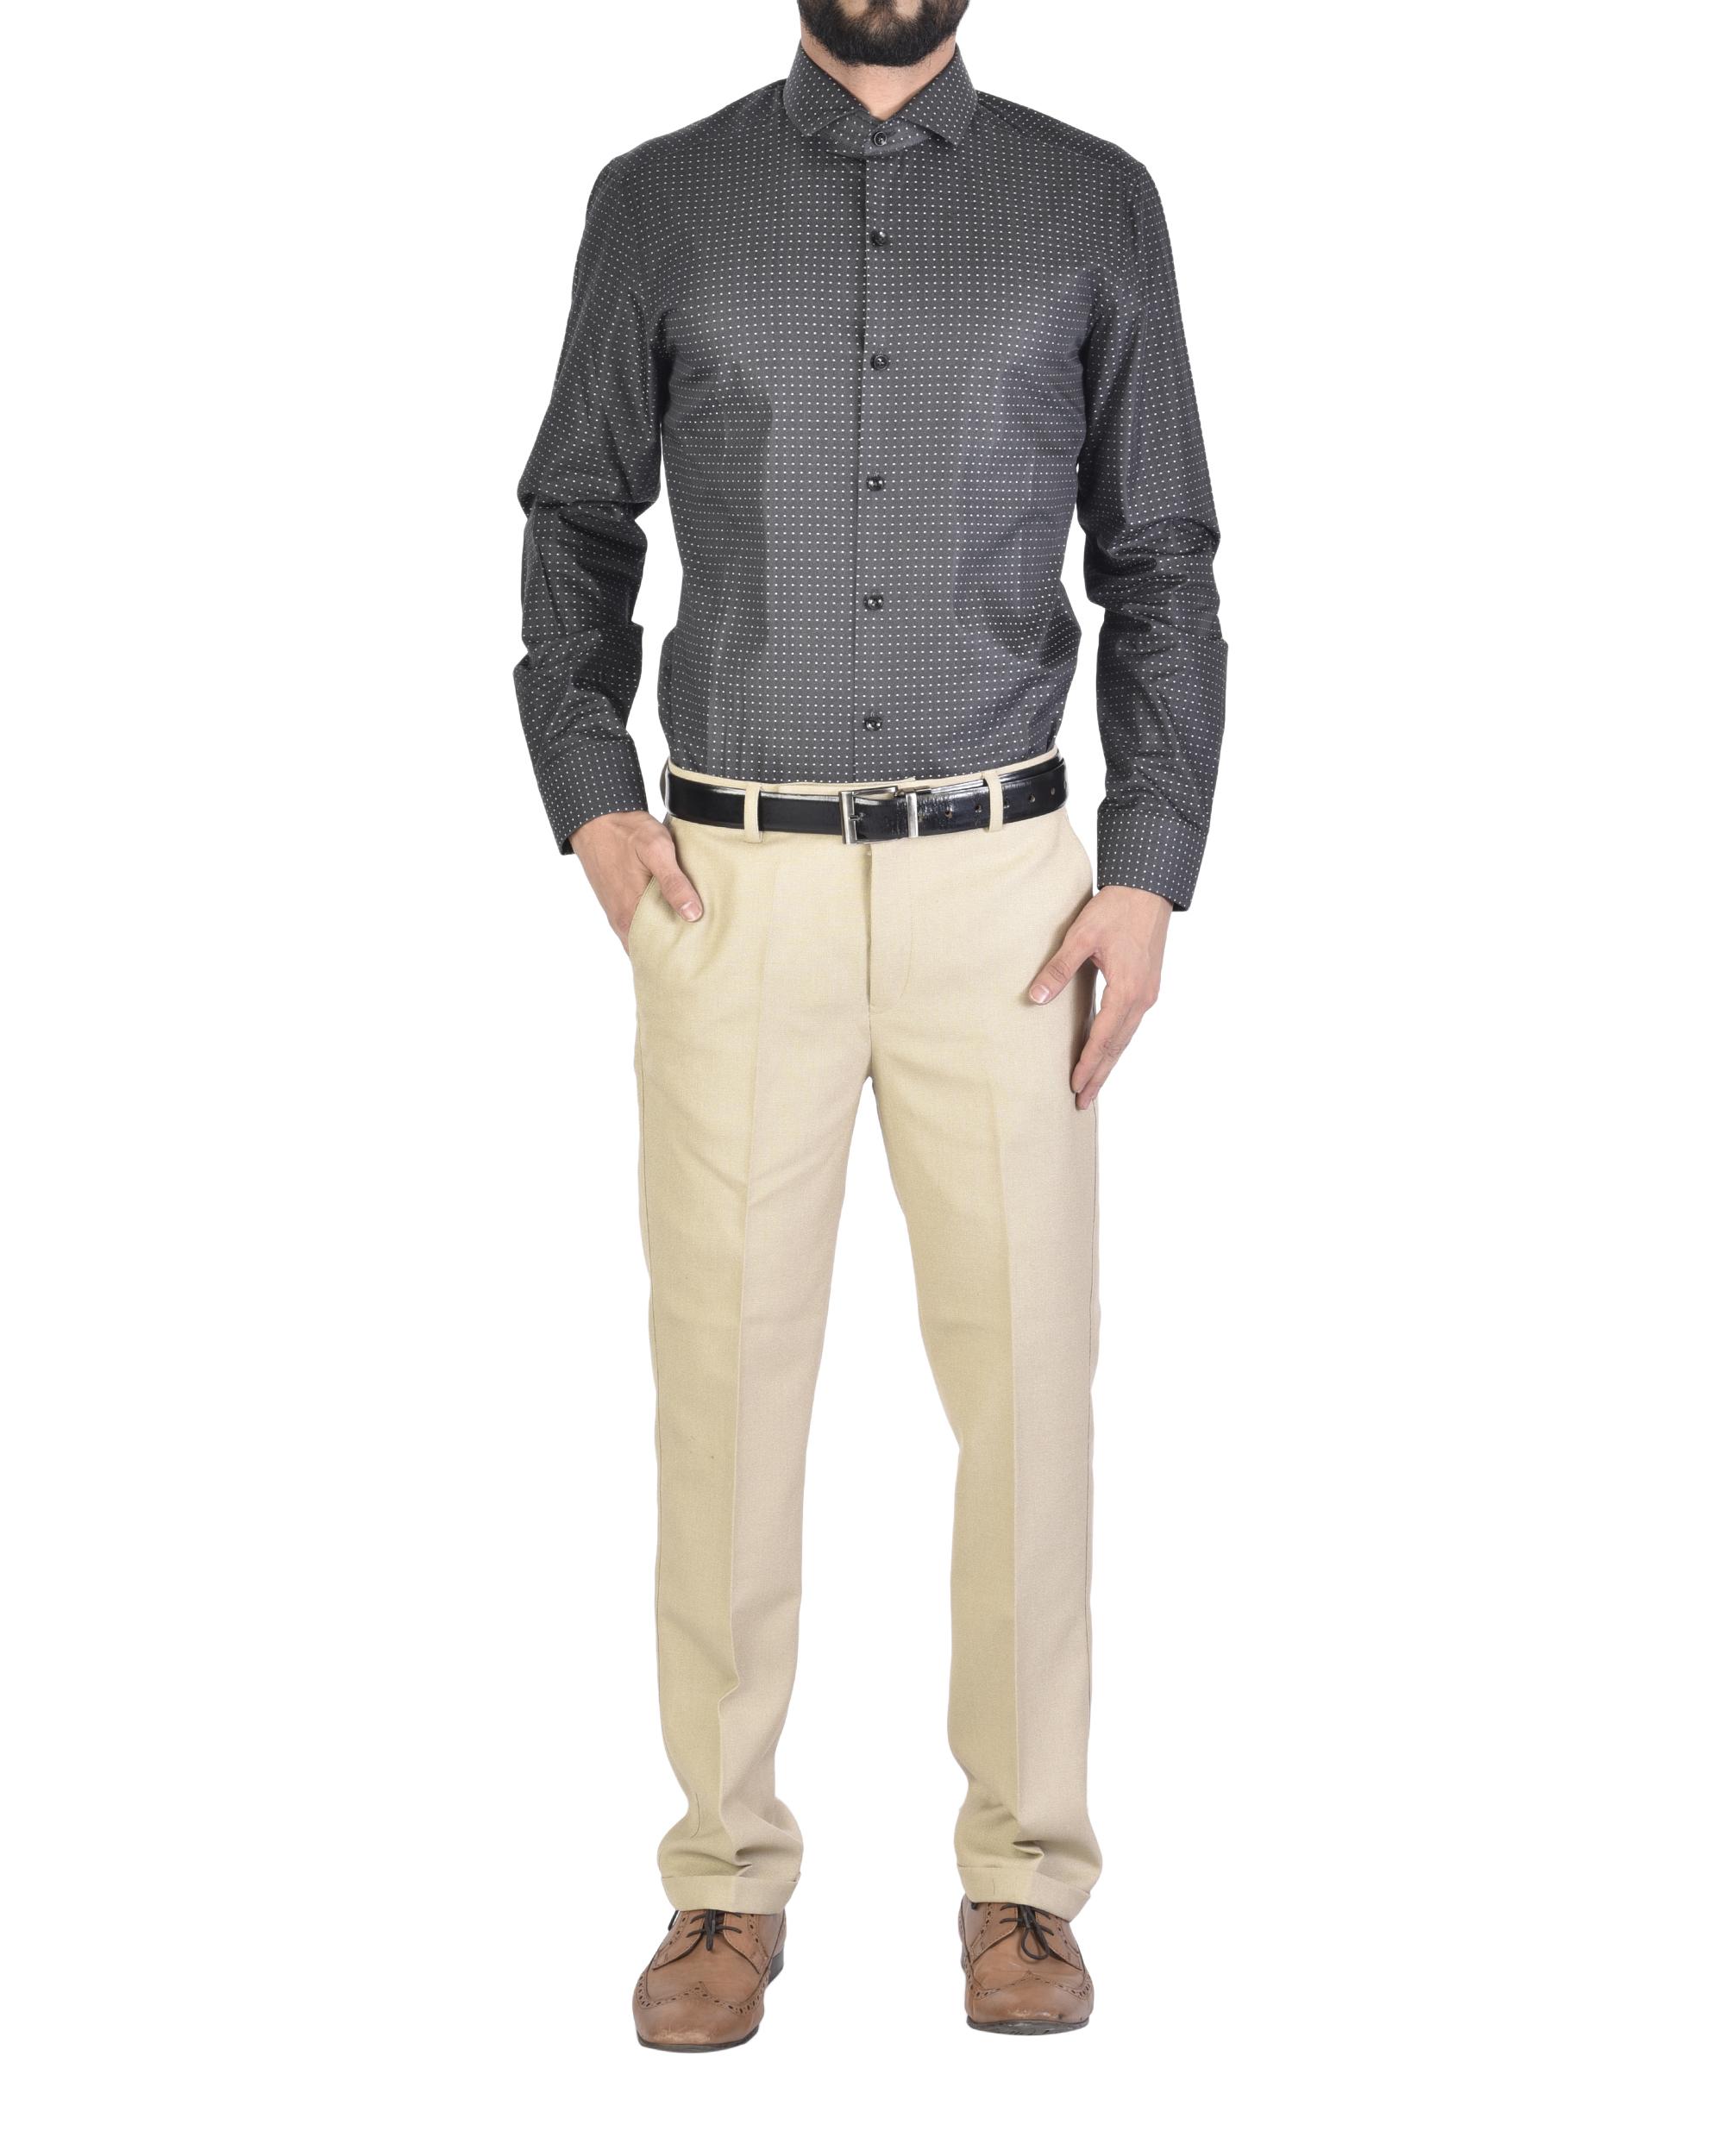 Charcoal black Shirt with motif